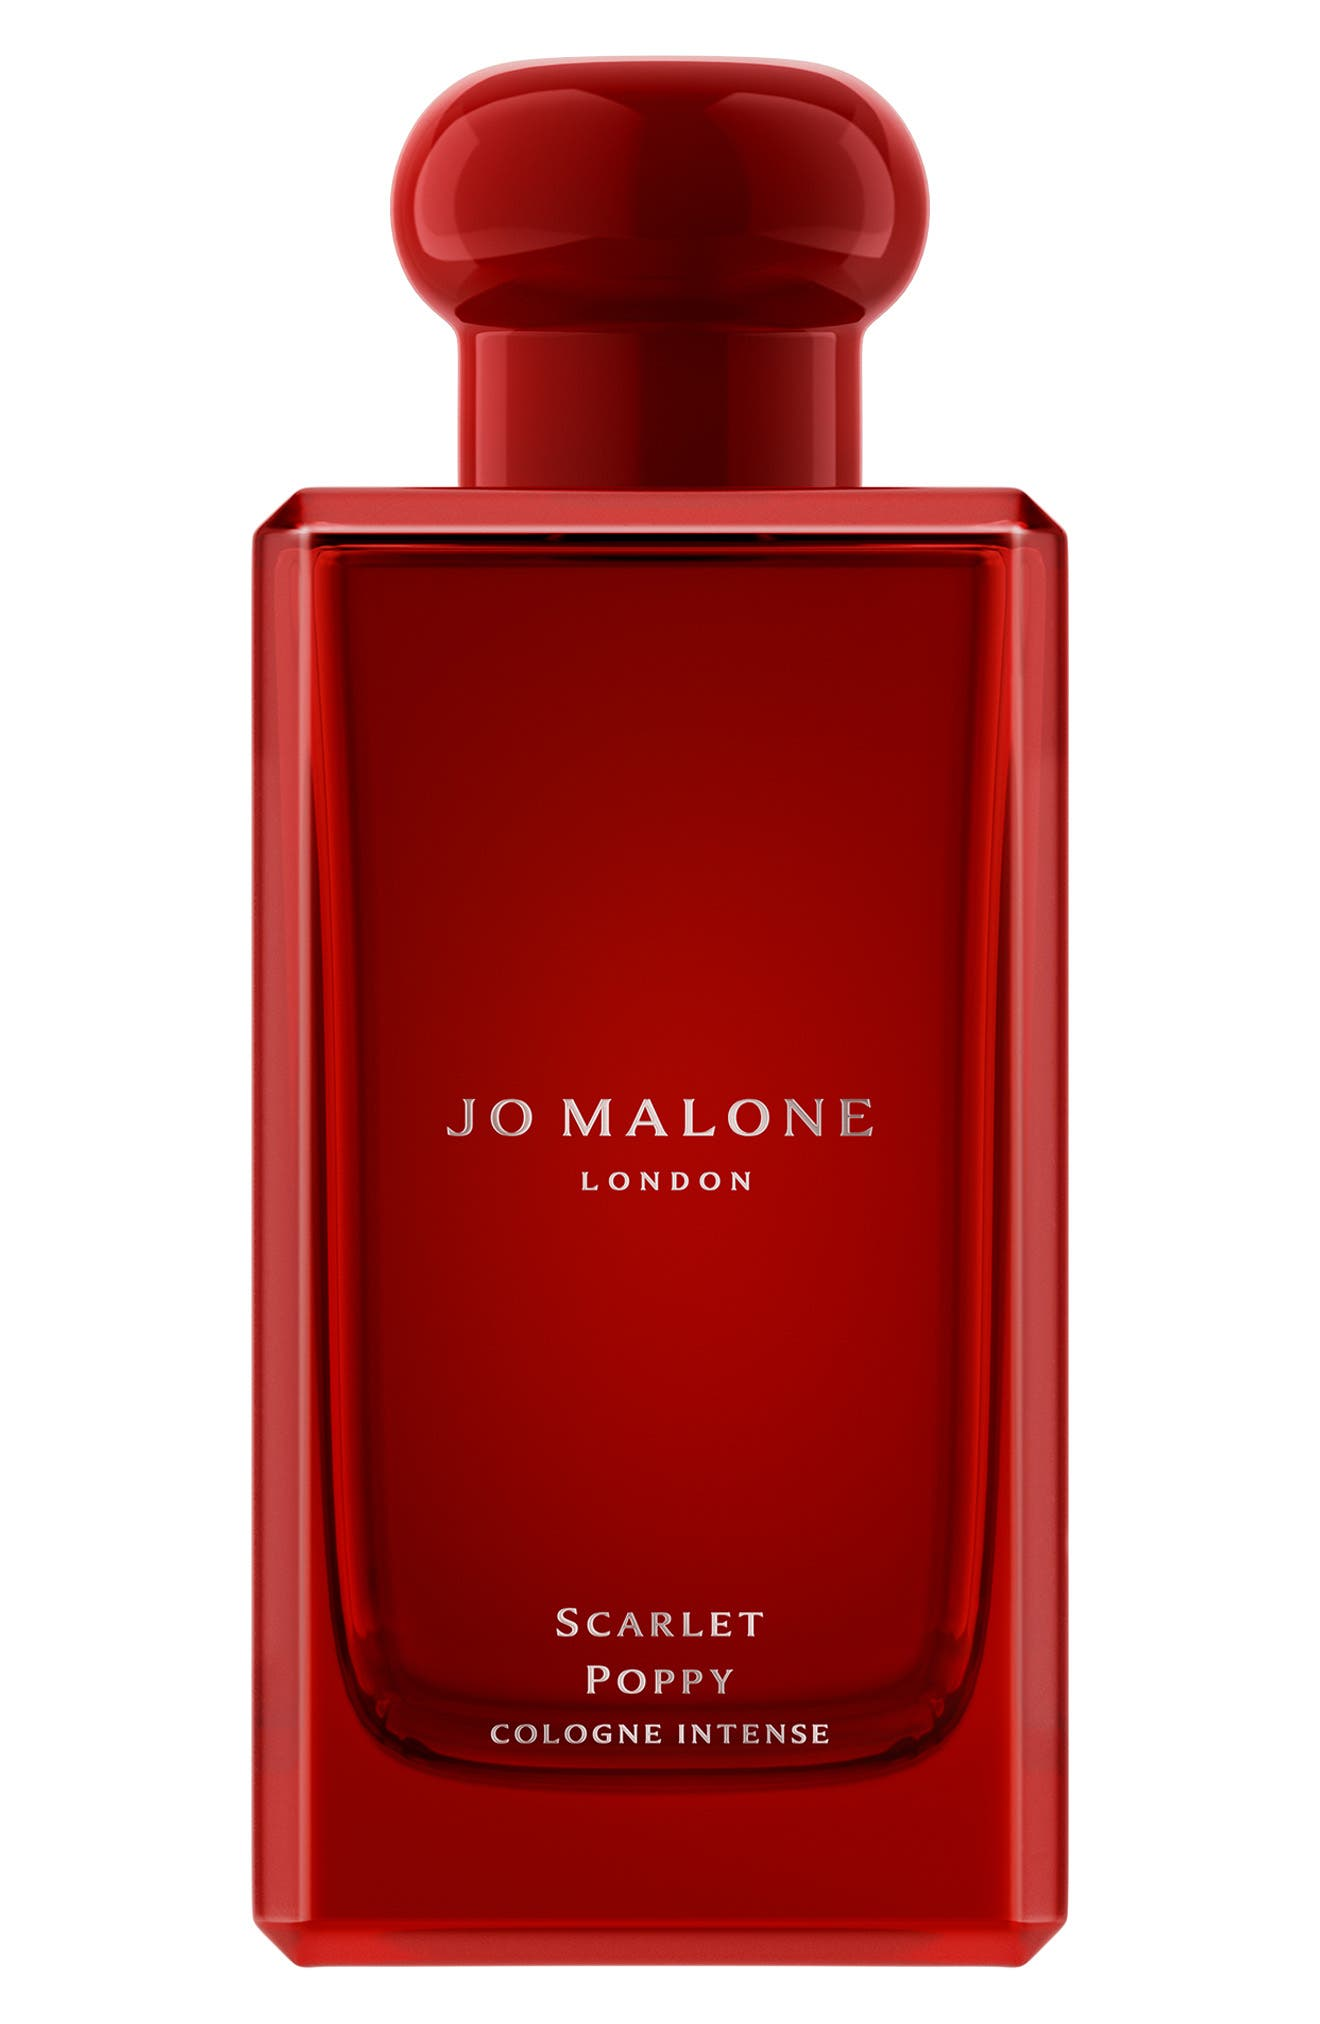 Jo Malone London(TM) Scarlet Poppy Cologne Intense